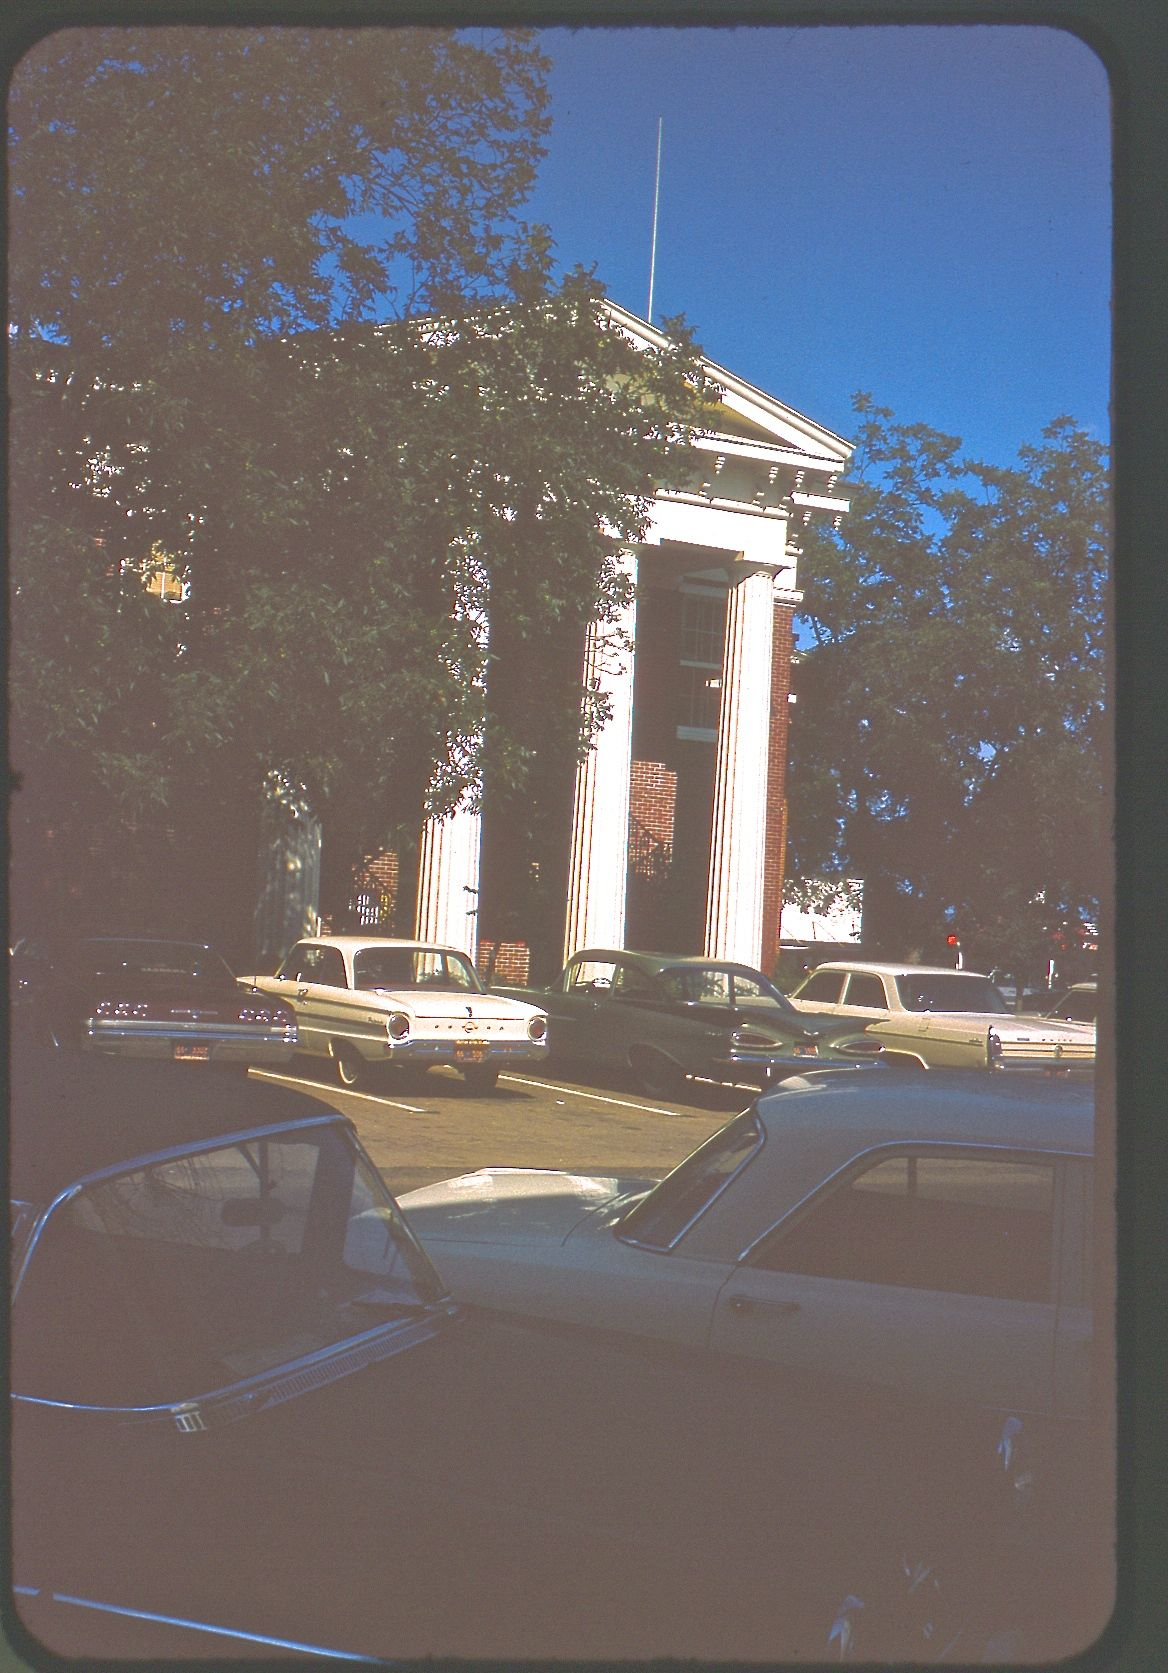 Alabama wilcox county camden - Wilcox County Courthouse Camden 1965